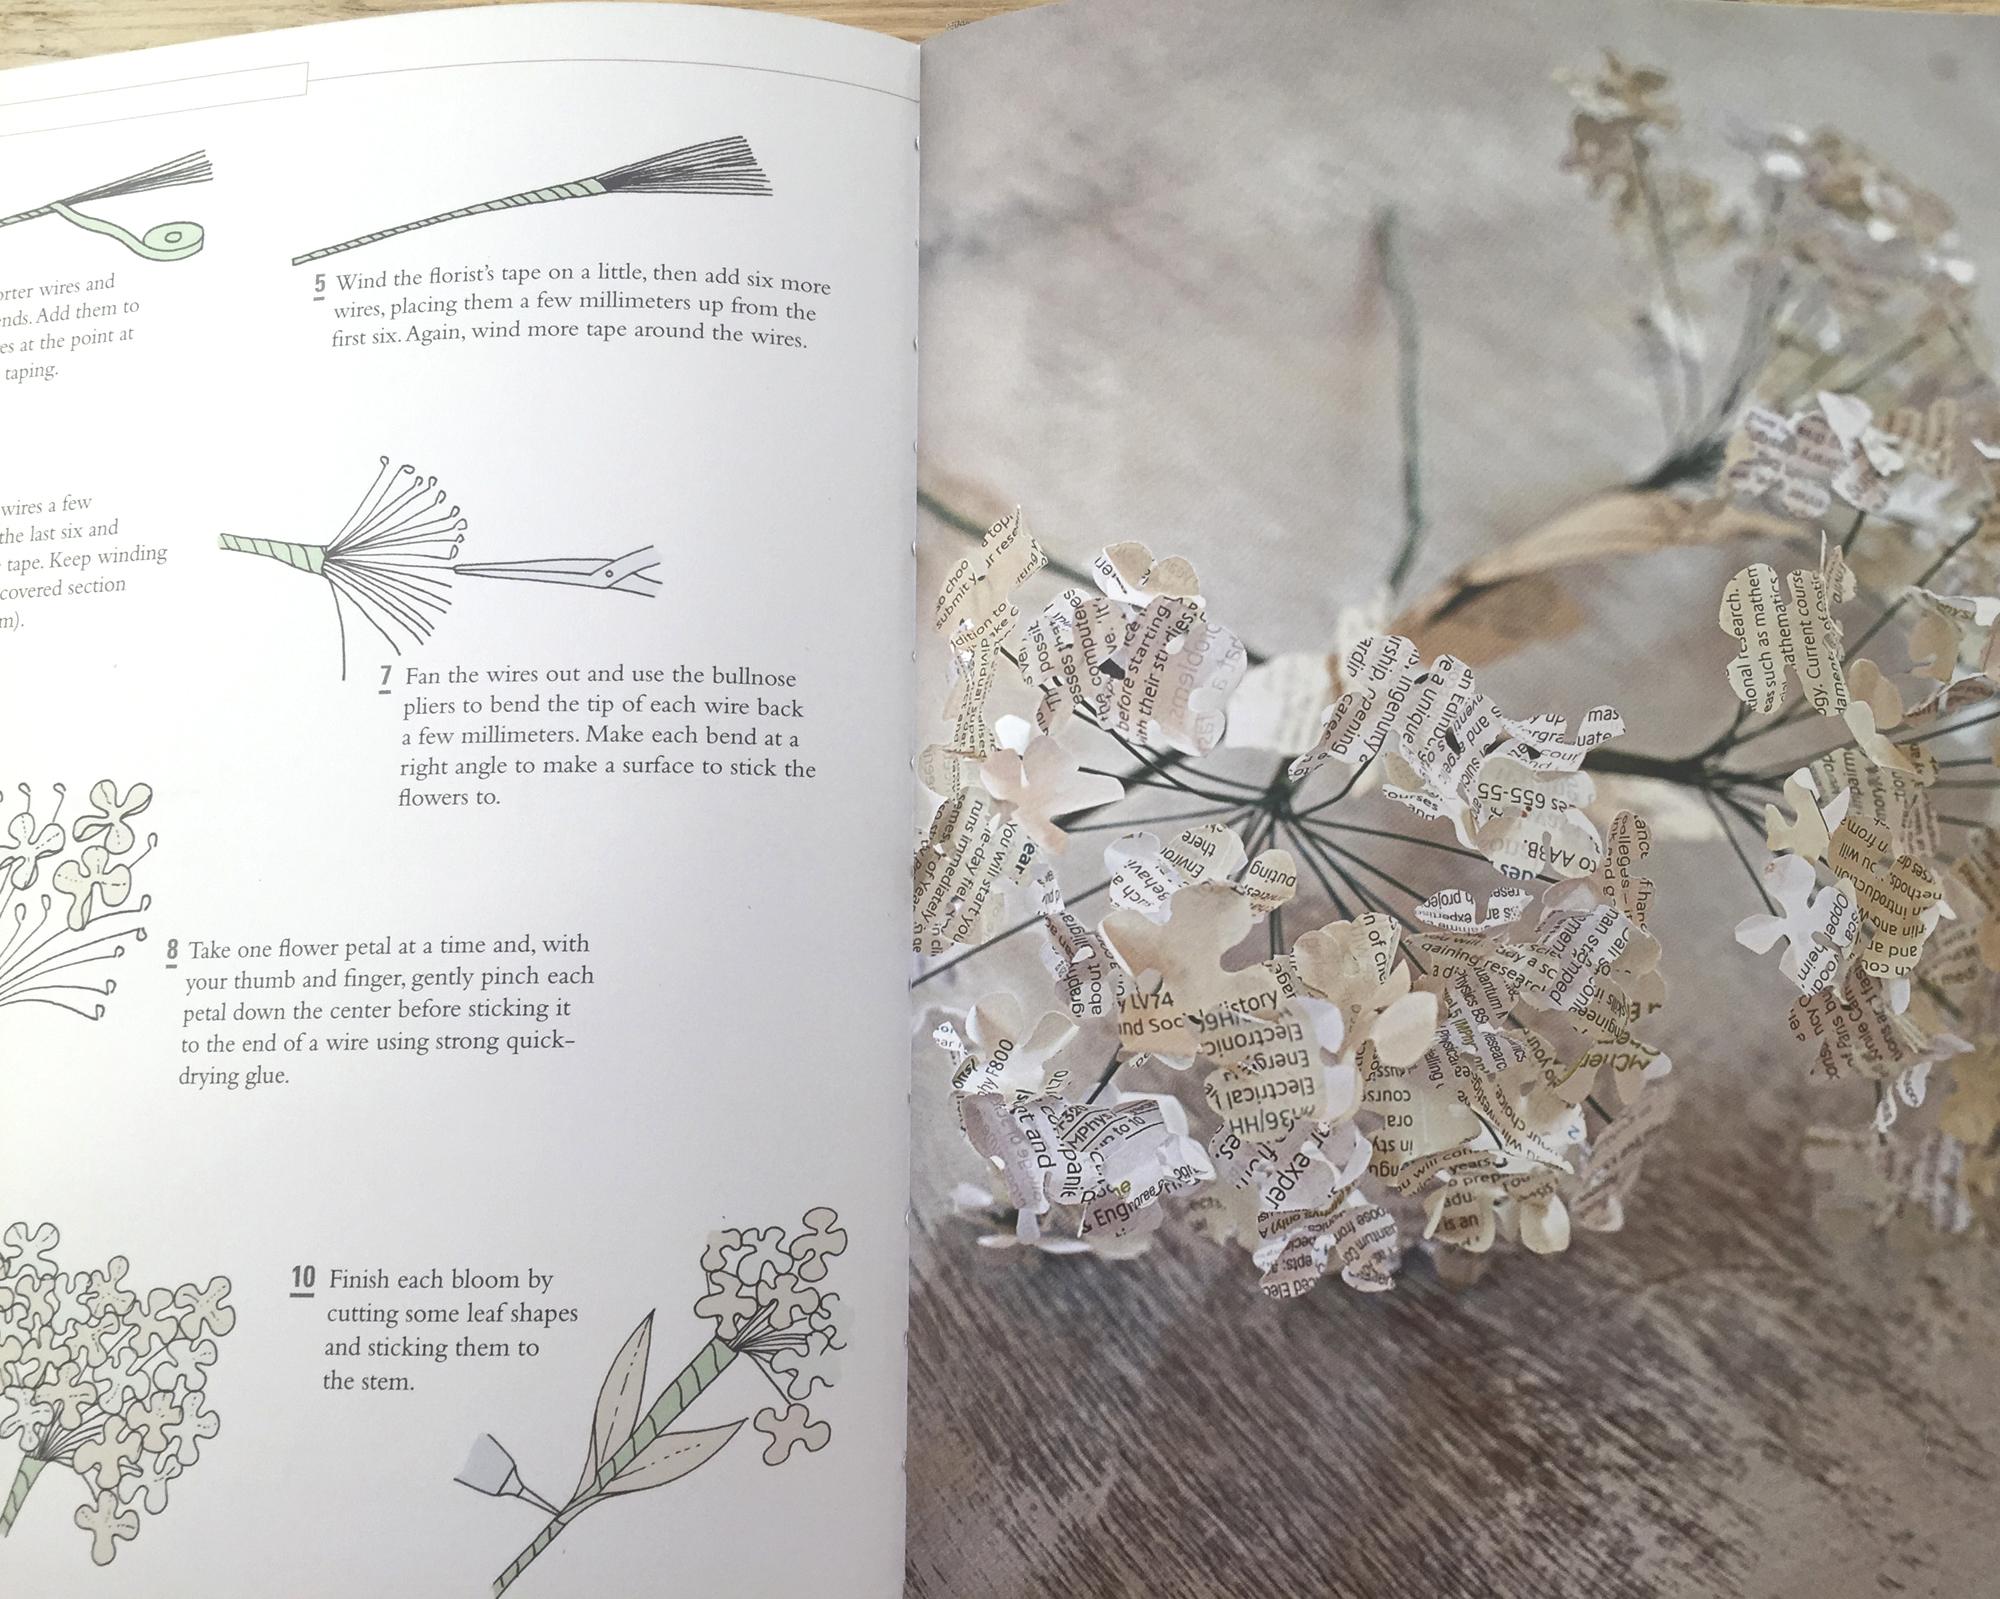 folded book art spread 2.jpg